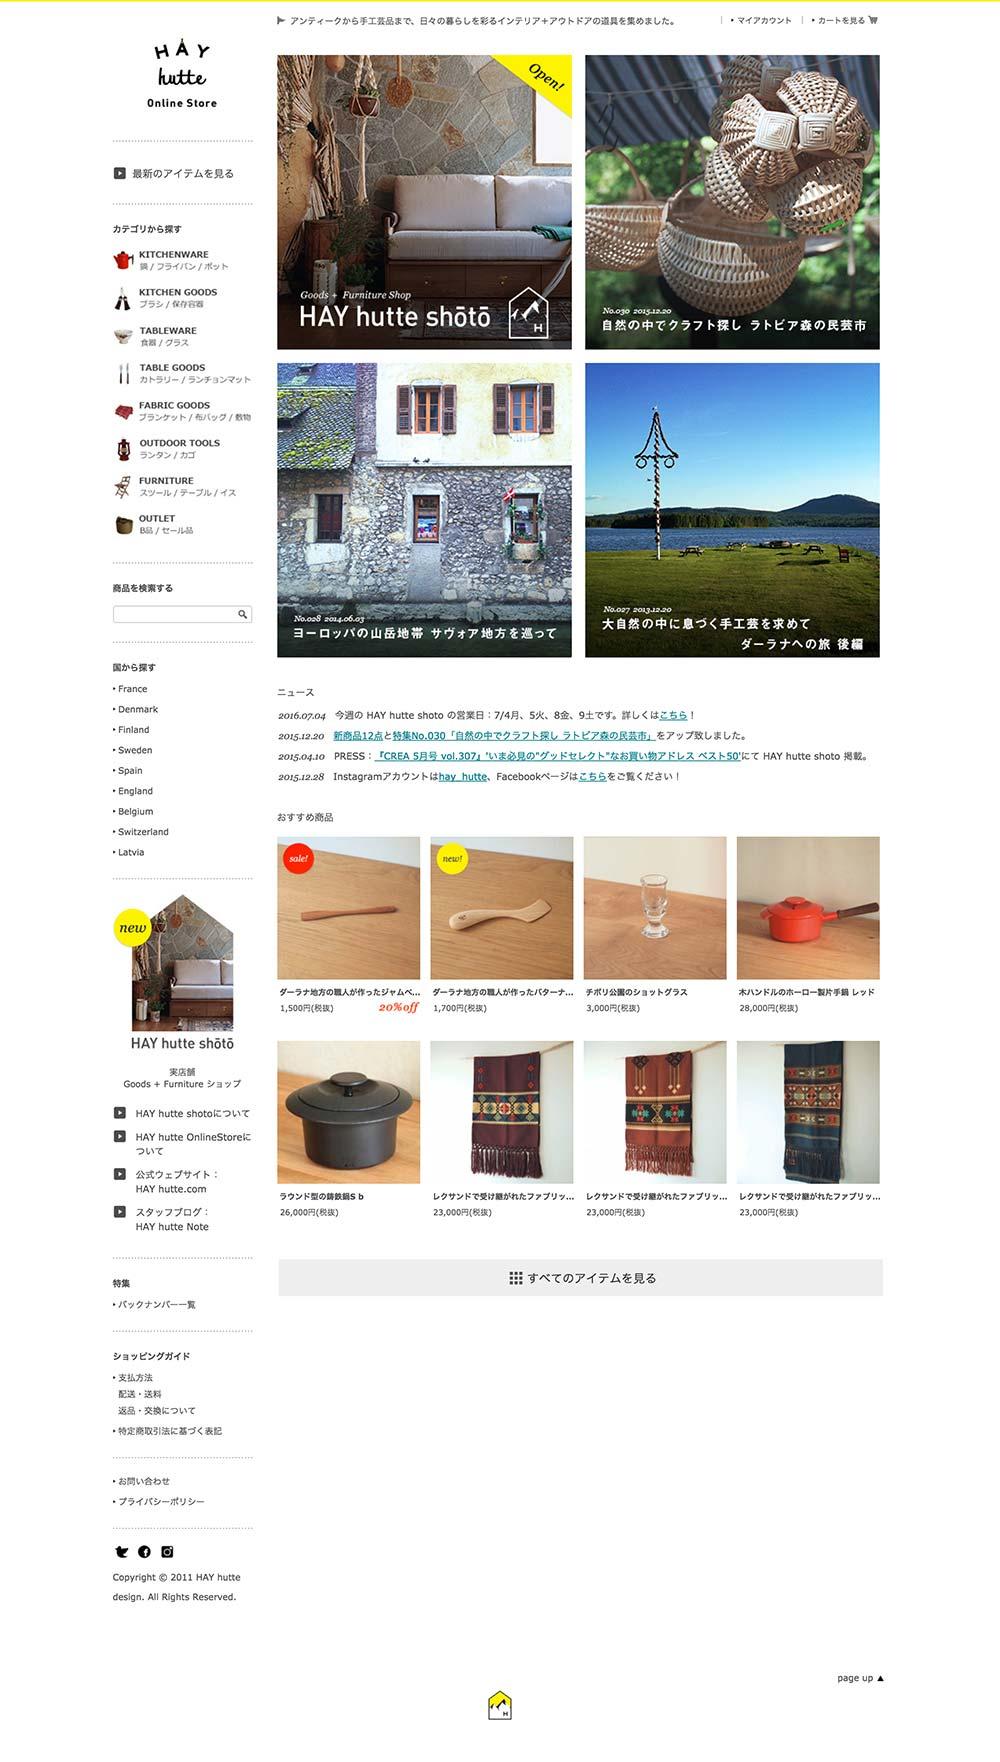 HAY hutte Online Store